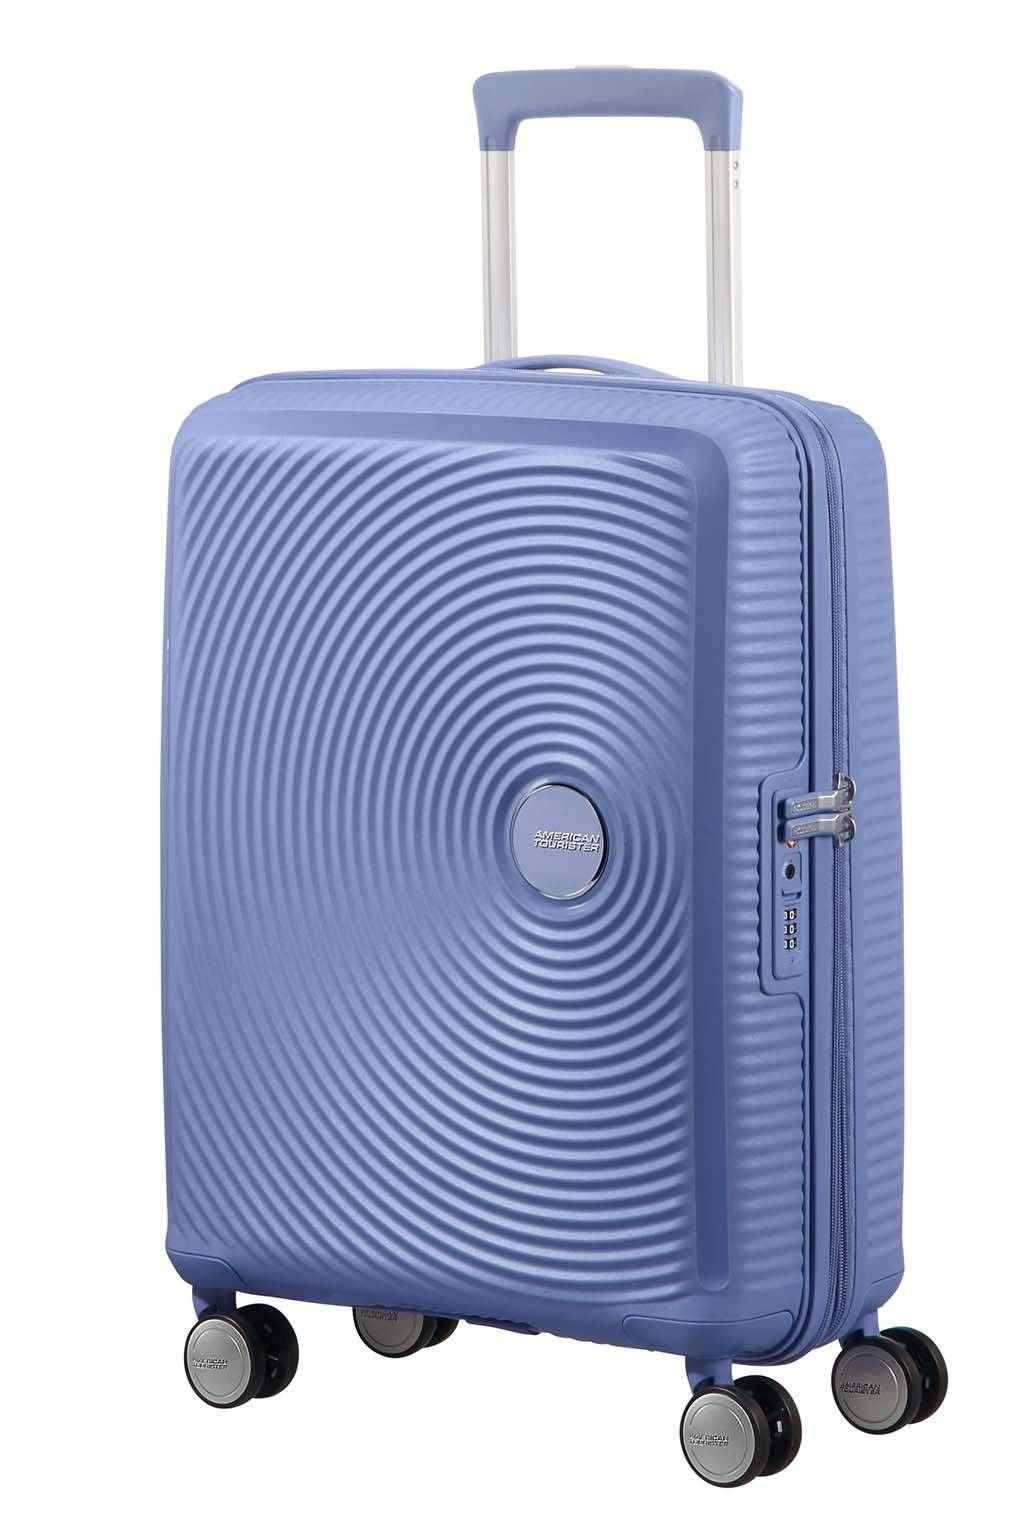 d4fd6dcc0 Precio reducido American Tourister Soundbox spinner Blue